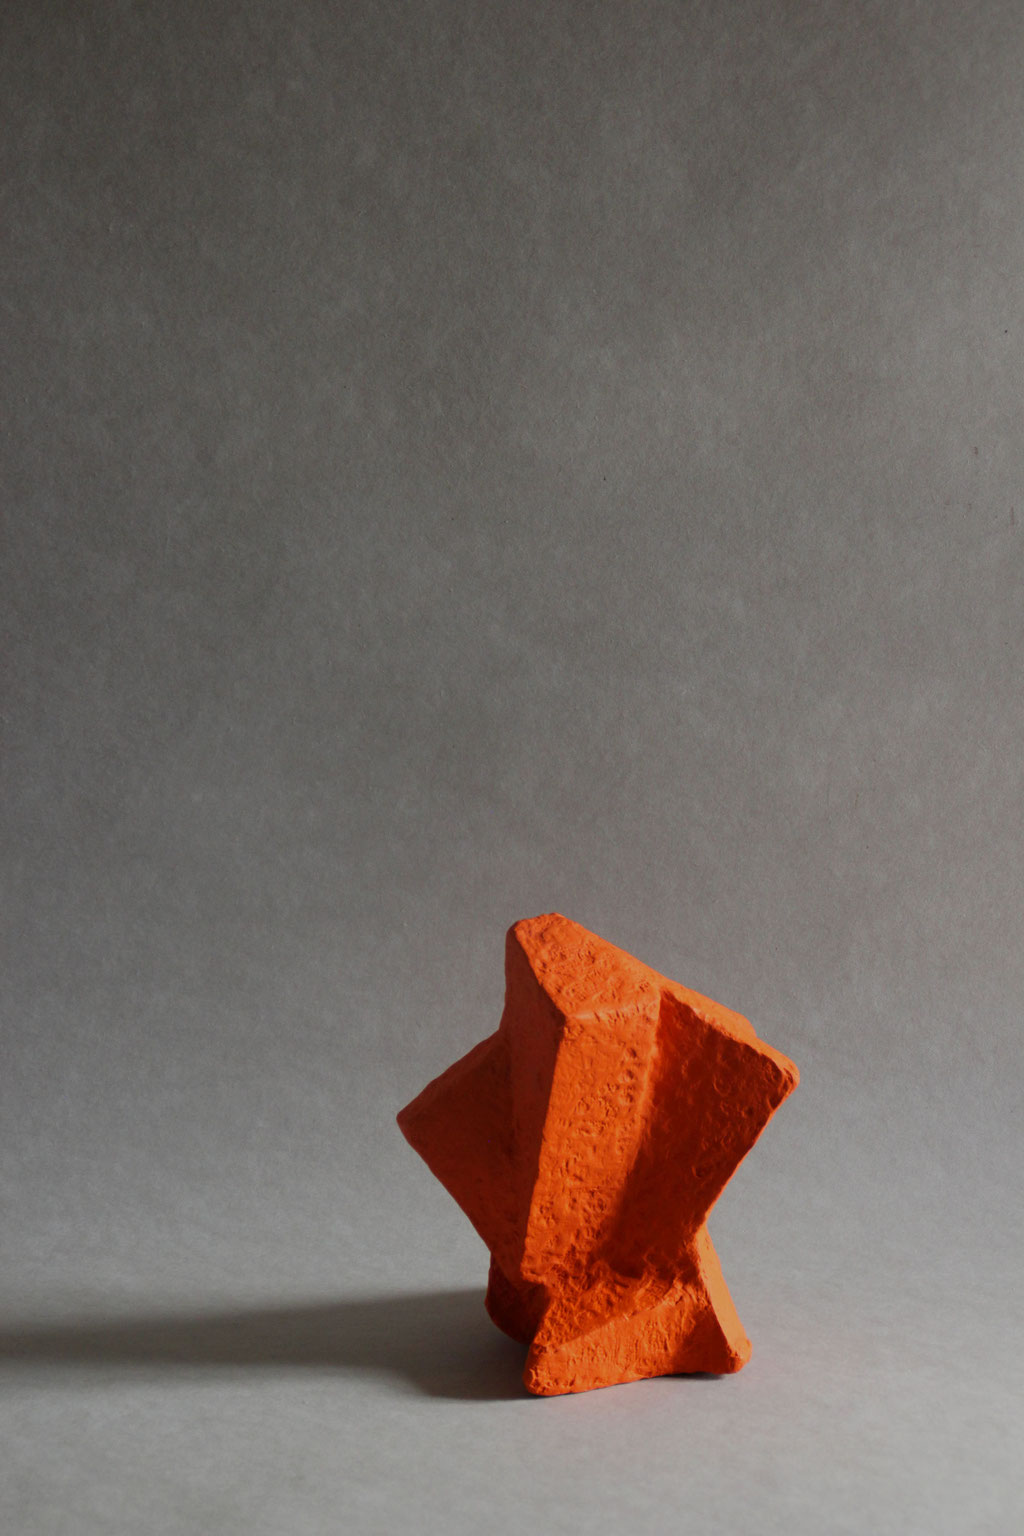 Particle small orange